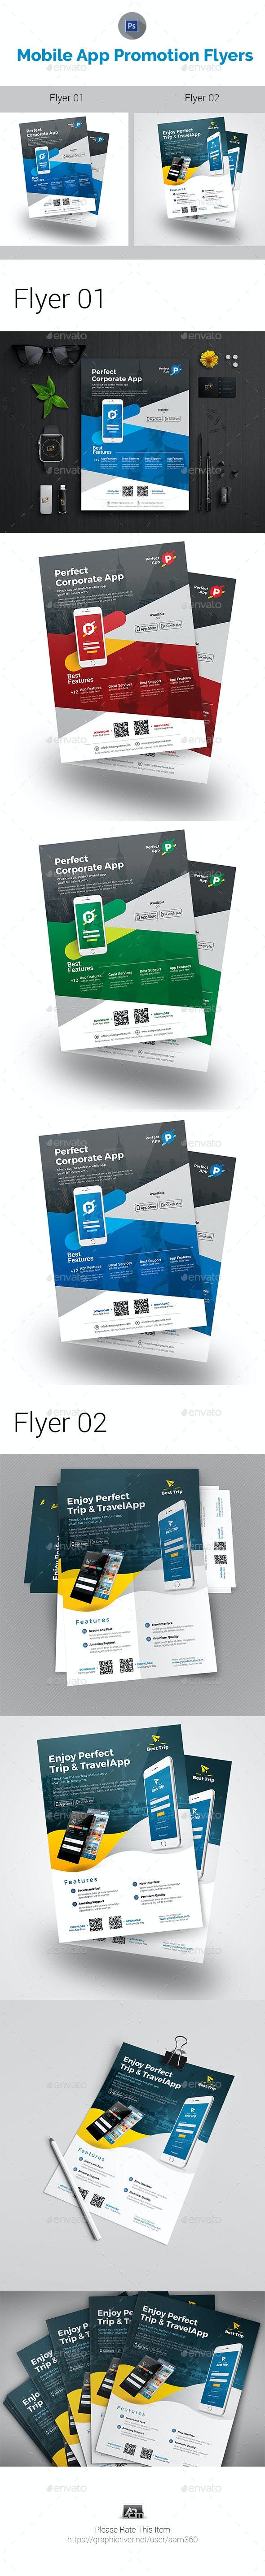 Mobile App Flyer Bundle - Corporate Flyers